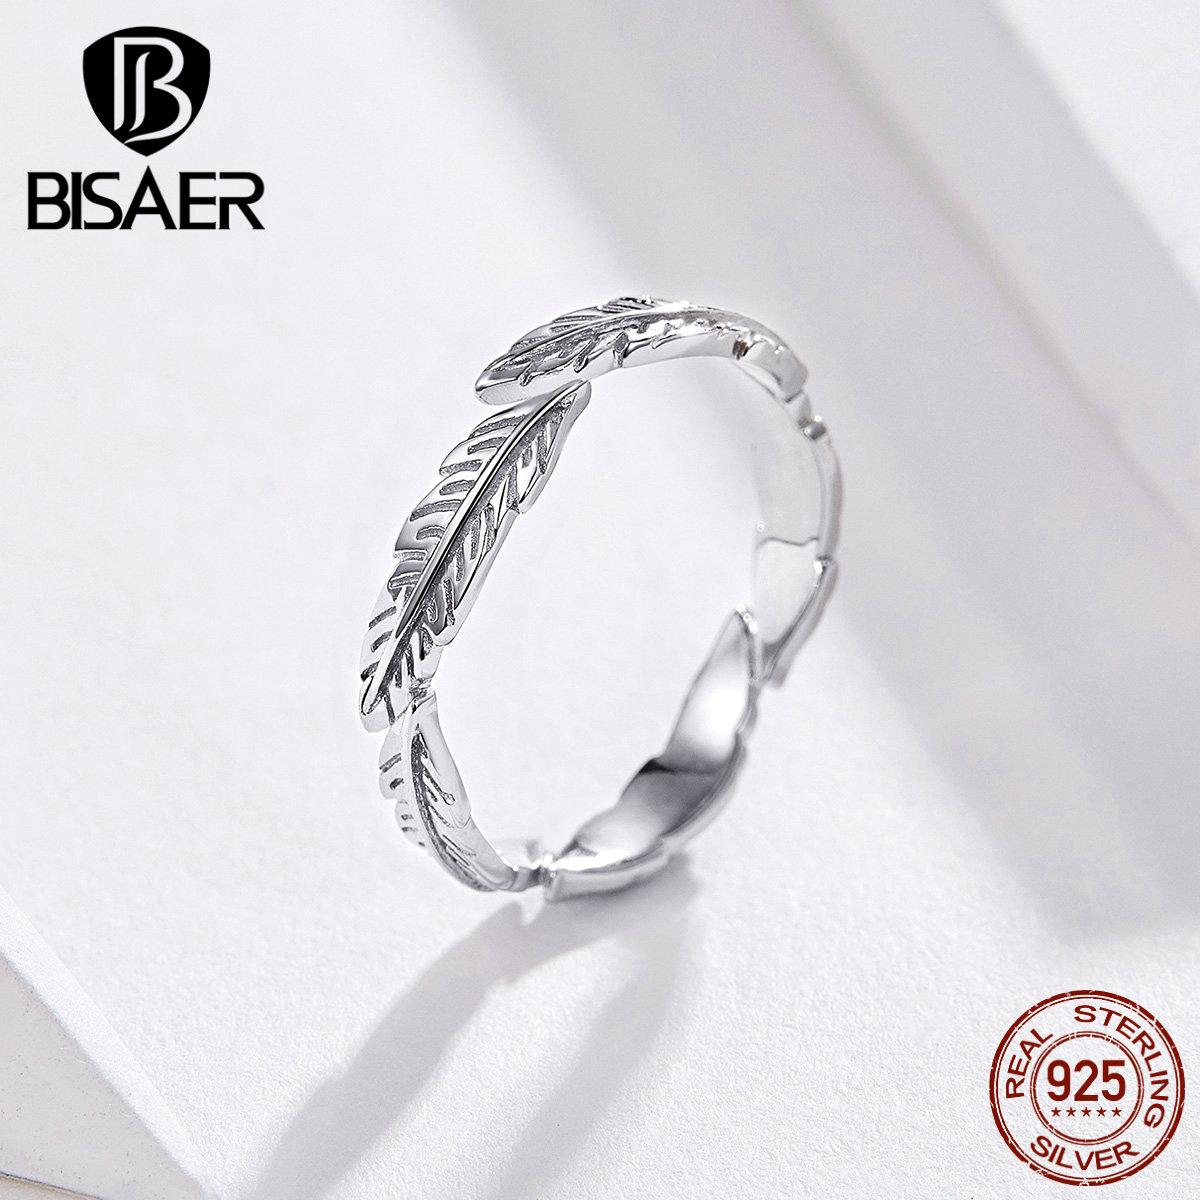 Anillo de plumas BISAER de Plata de Ley 925 con alas Vintage, anillos de dedo de plumas para mujer, joyería de plata de ley de tamaño ajustable ECR517